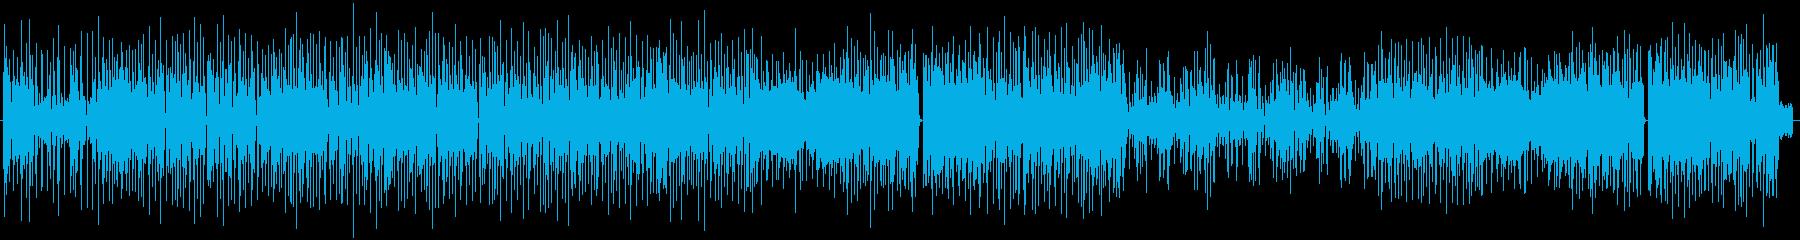 BlueBoy 楽器のみバージョンの再生済みの波形